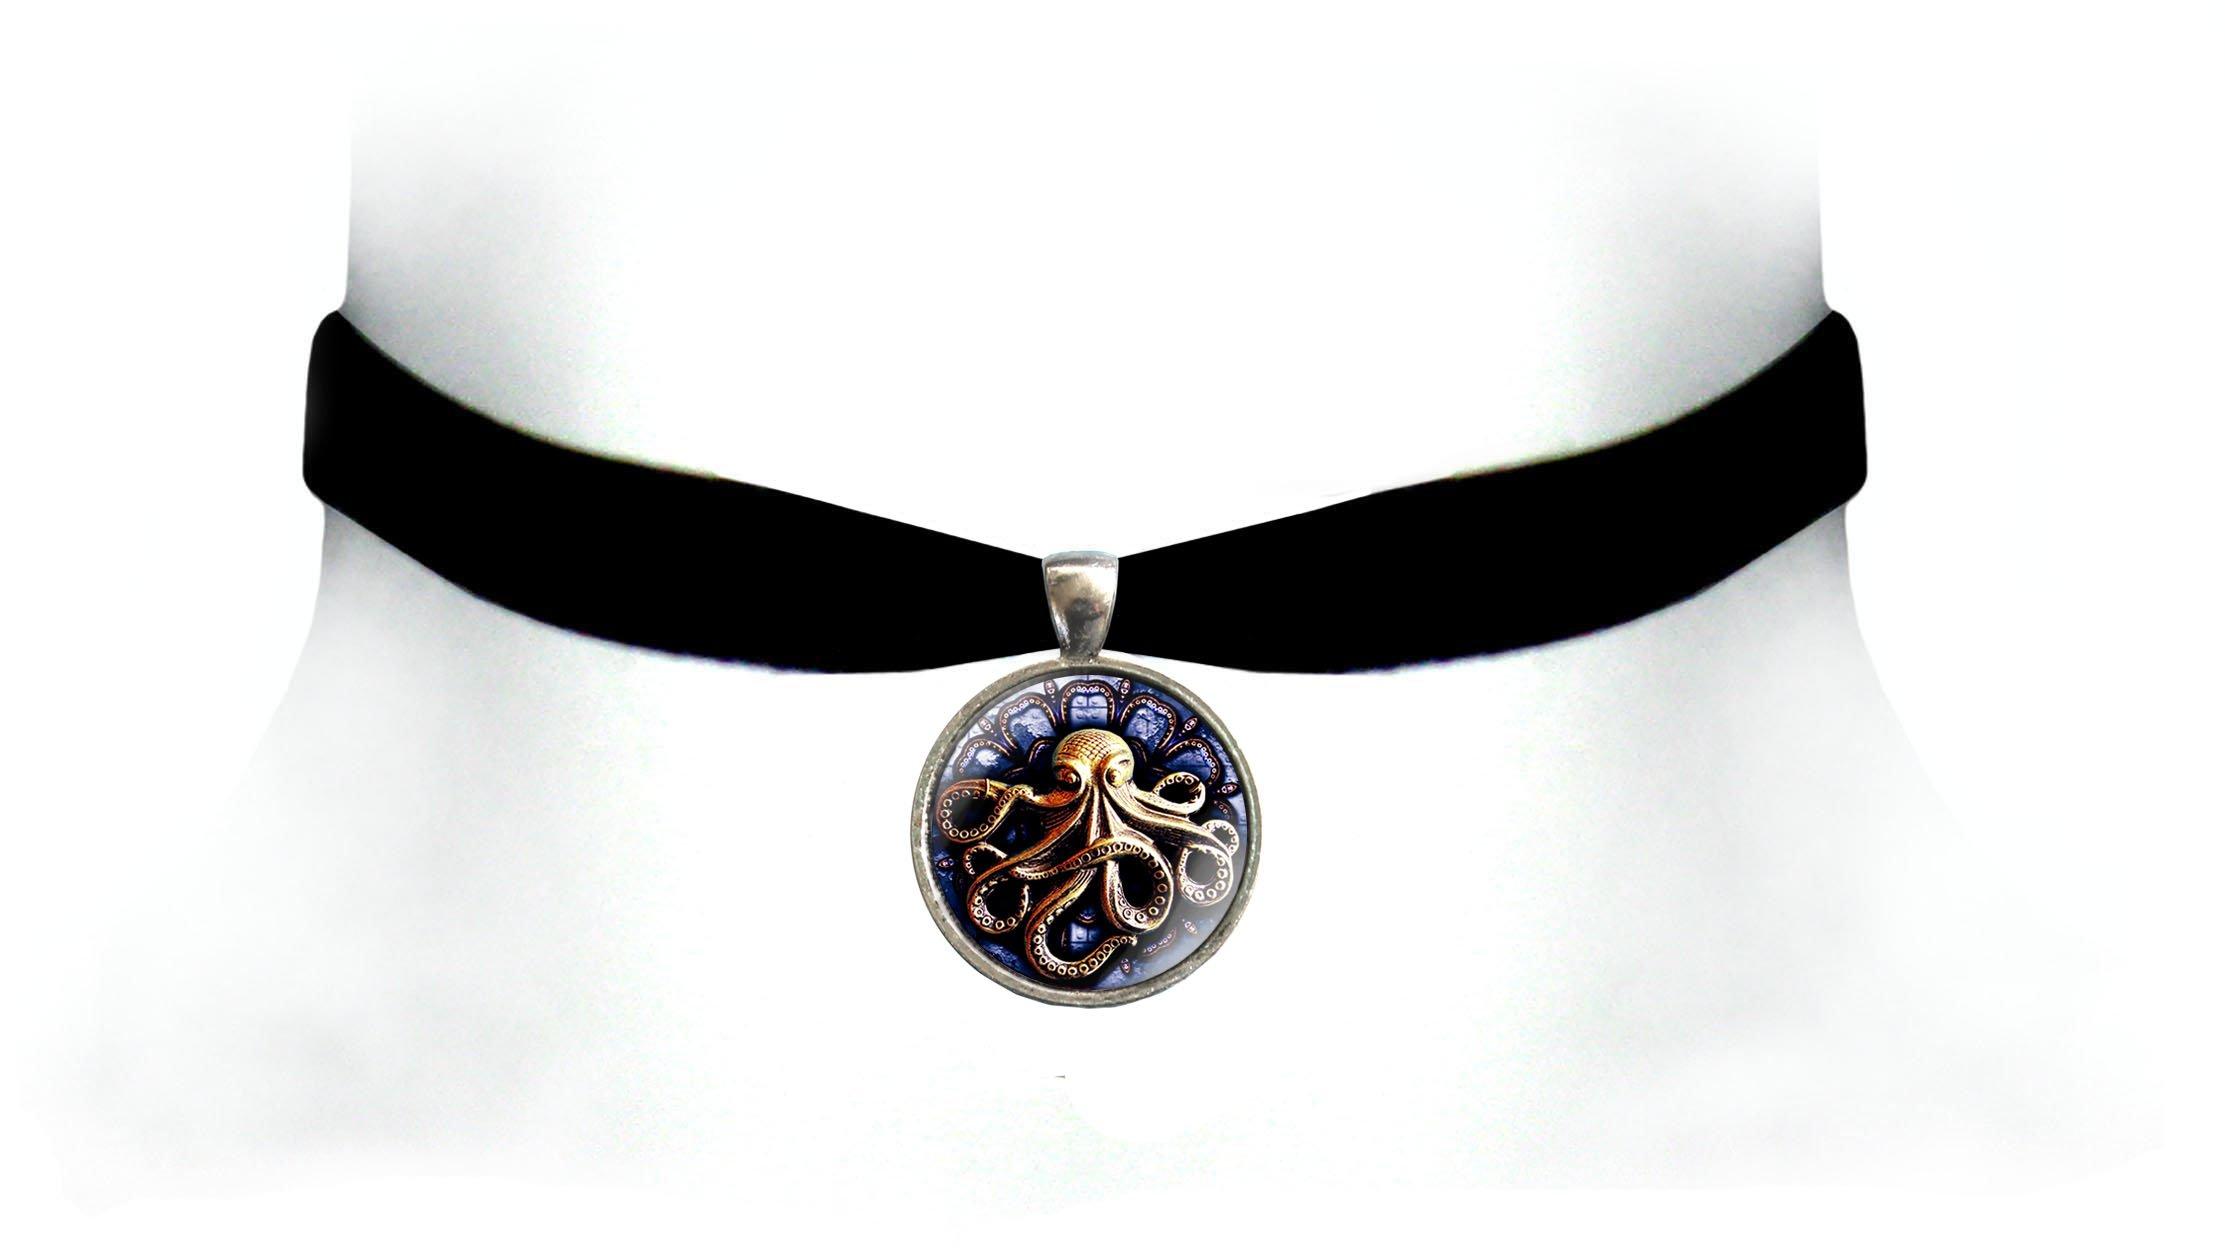 Victorian Vault Kraken Octopus Black Velvet Choker Steampunk Gothic Pendant Necklace 3